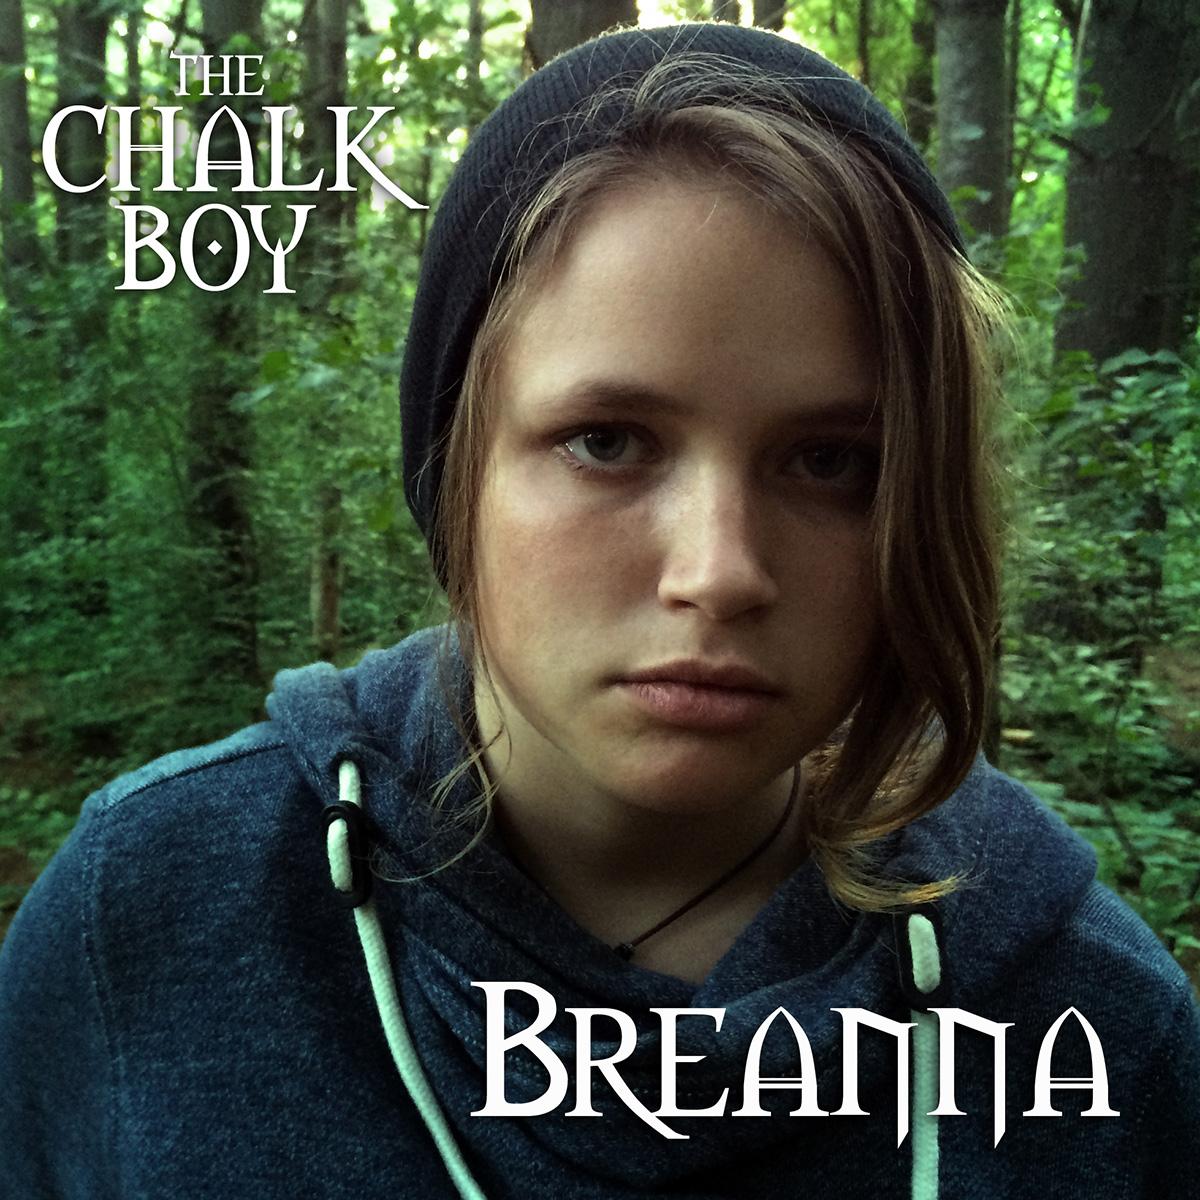 Breanna-01.jpg